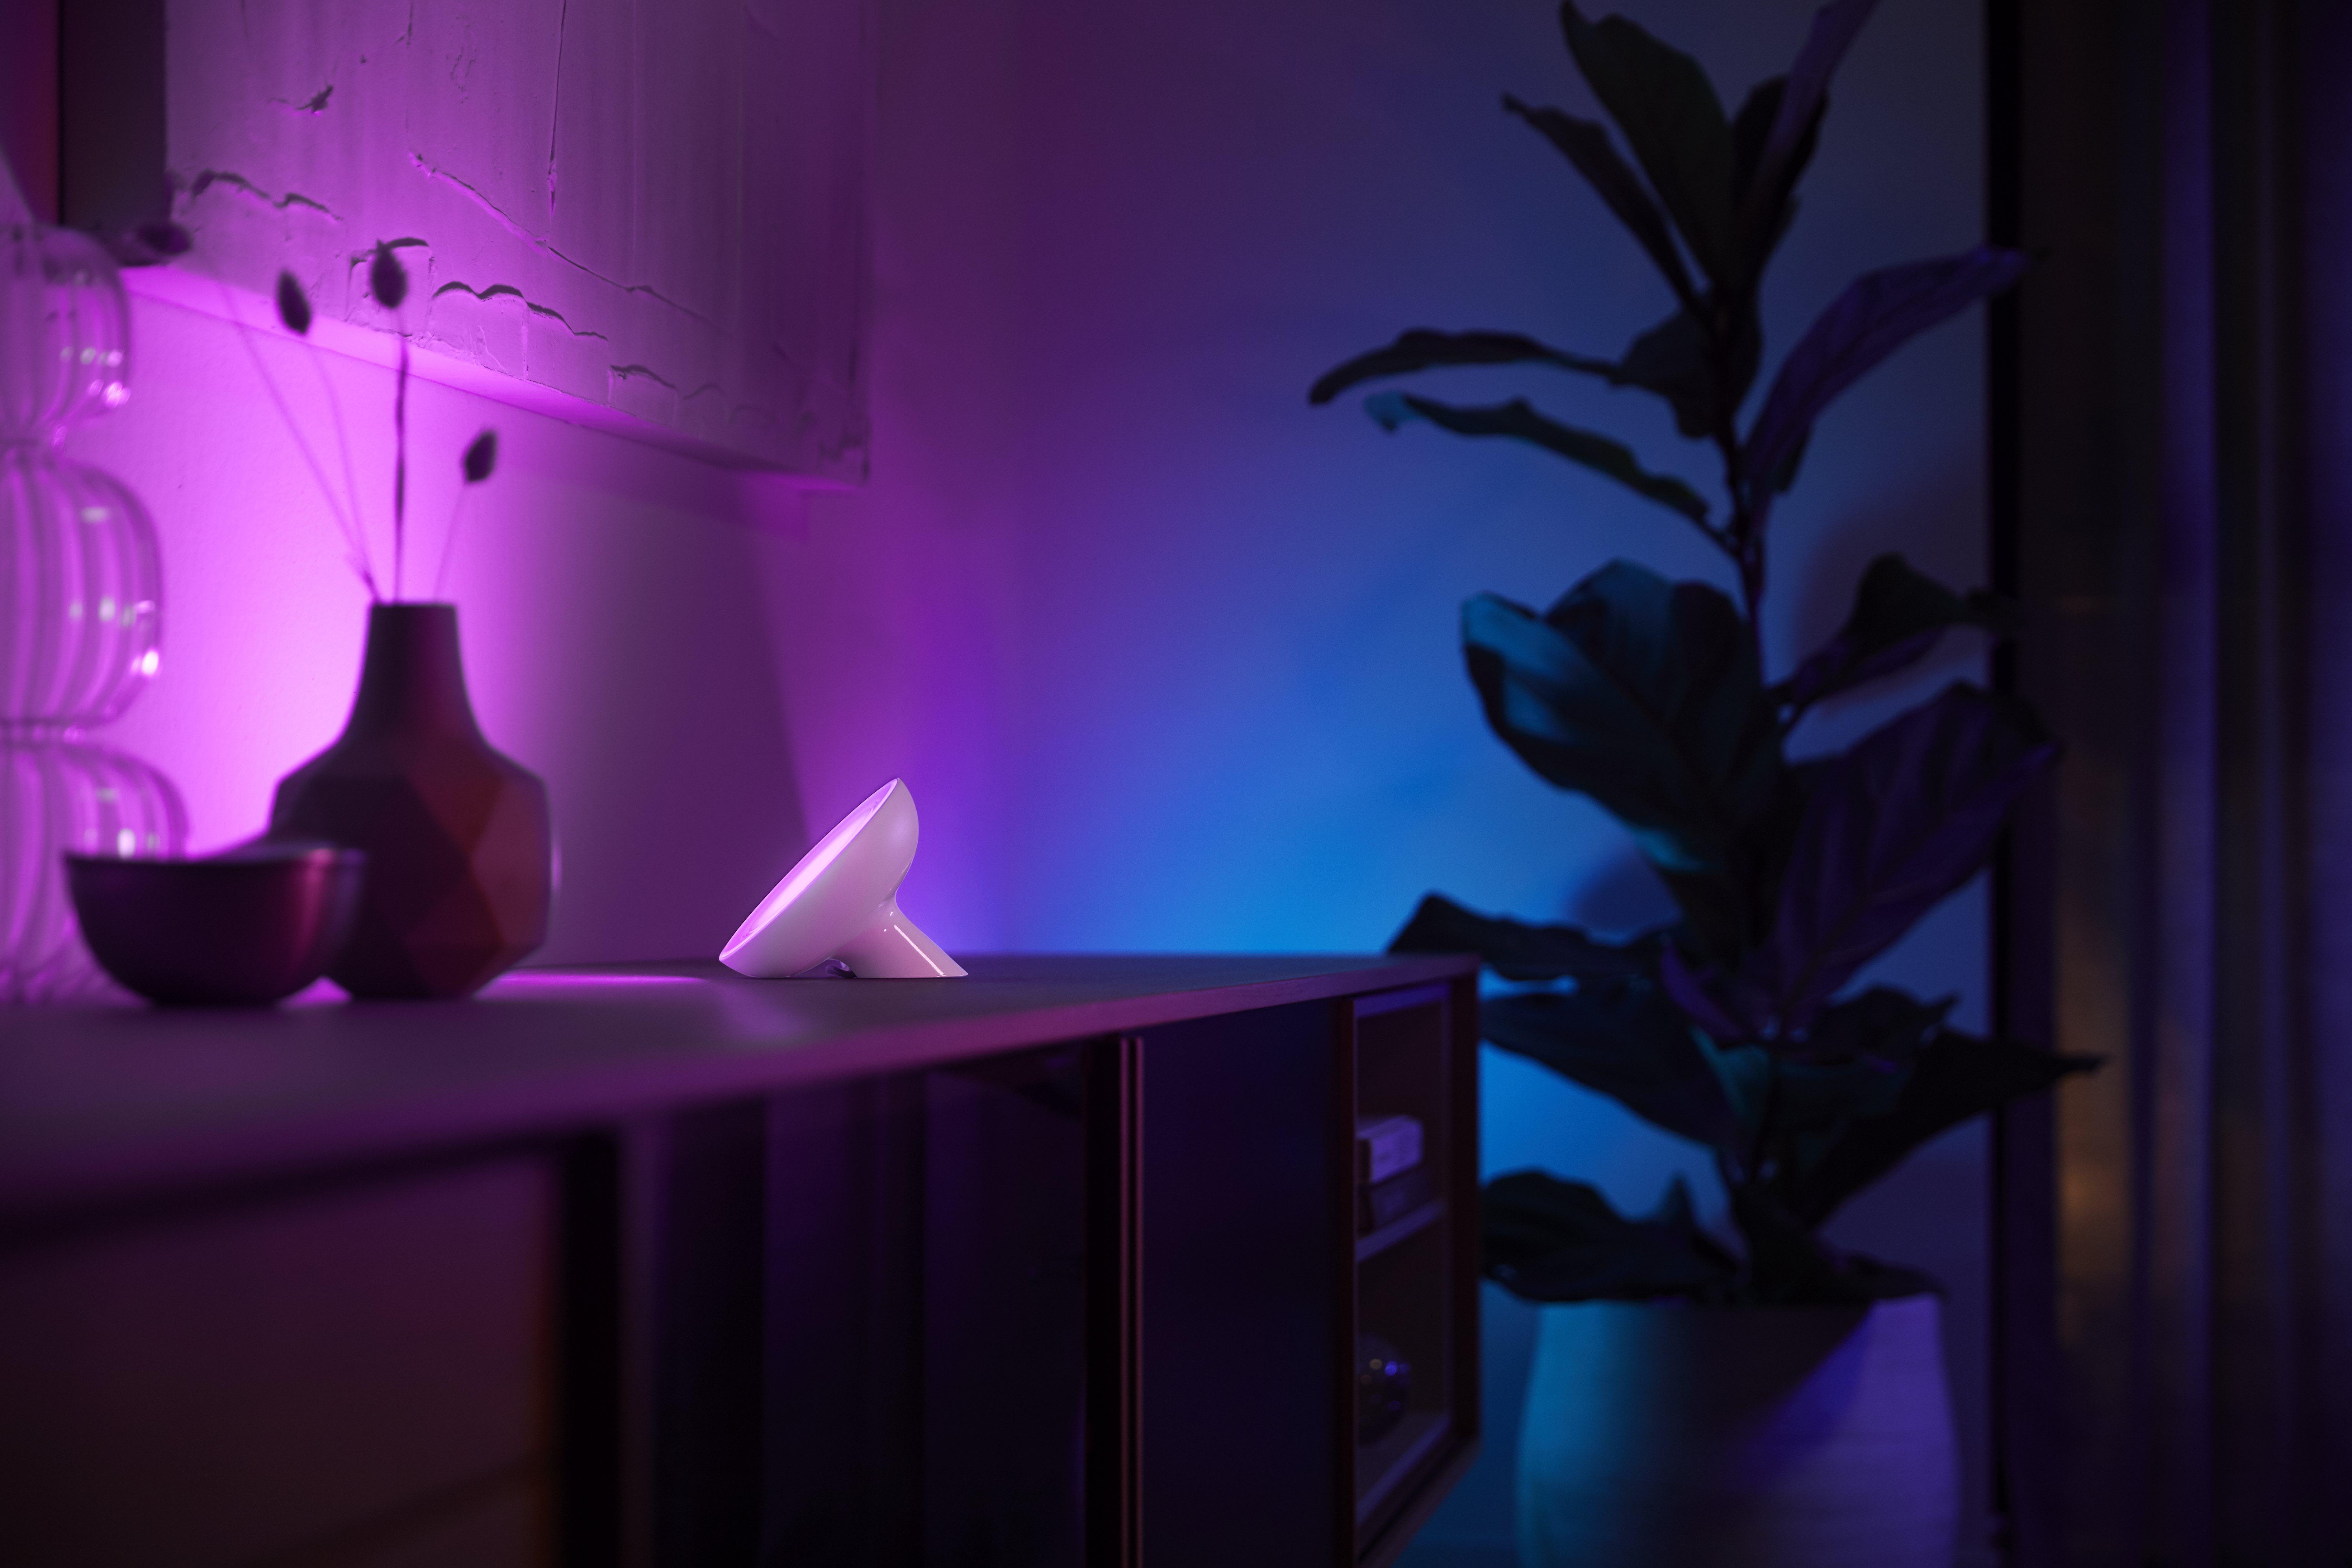 HomeKit Weekly: Ready to change up your lights? Philips Hue has plenty of options